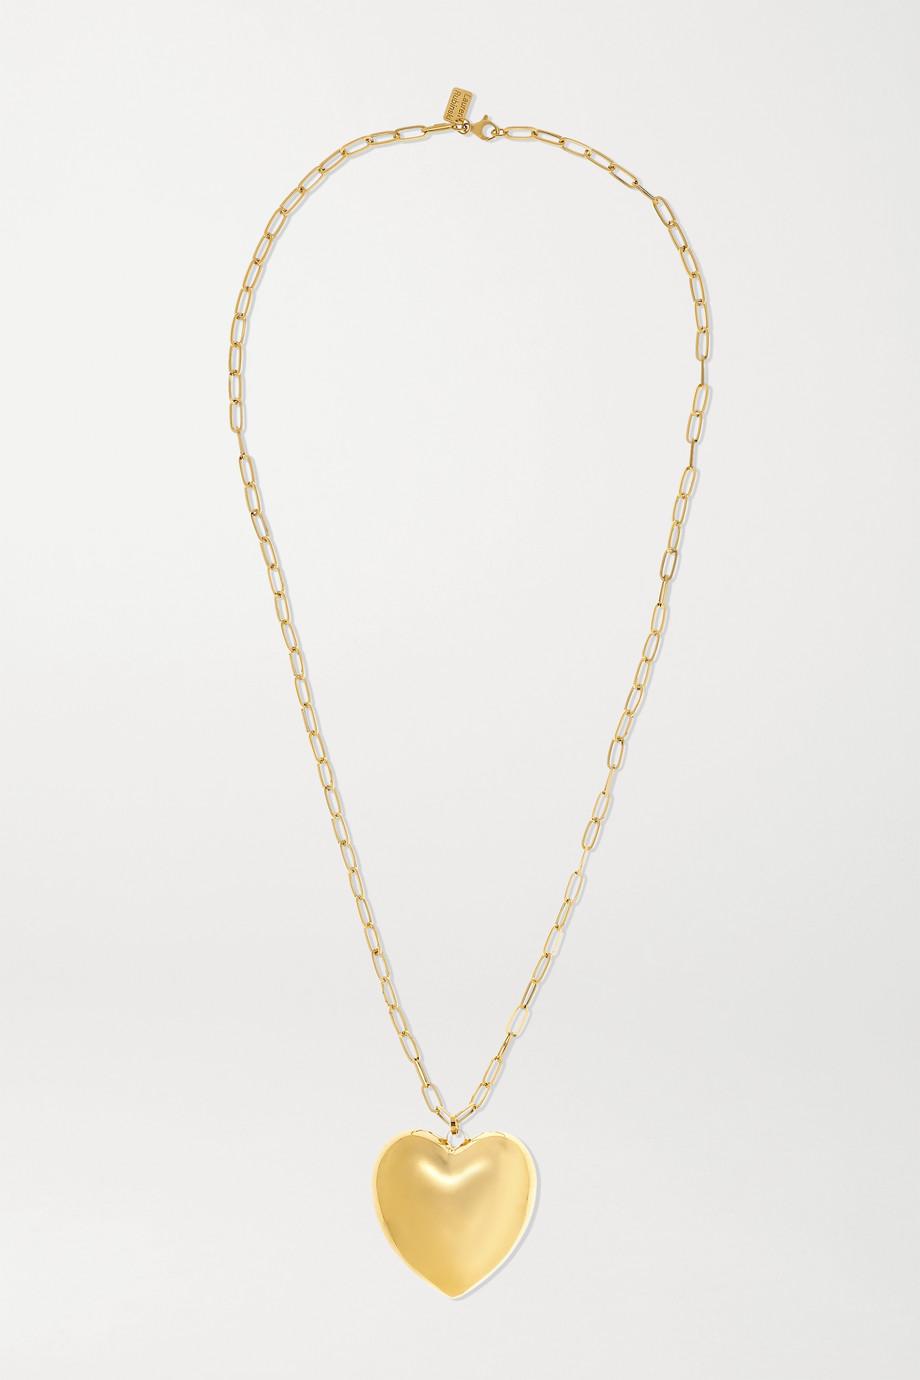 Lauren Rubinski 14-karat gold necklace